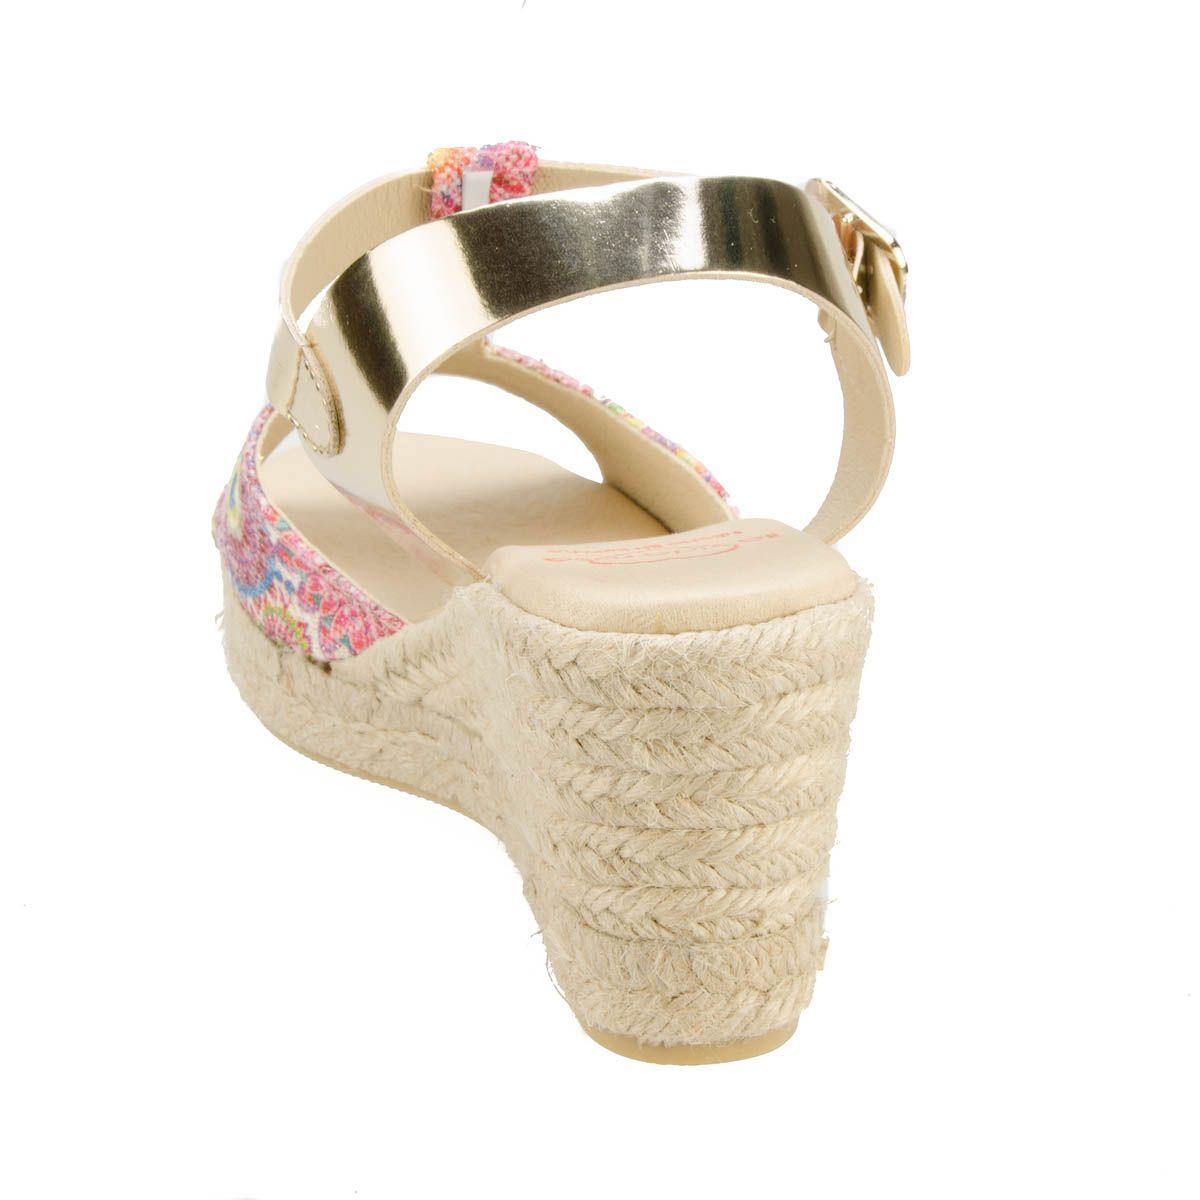 Leindia Sparto Wedge Sandal in Pink